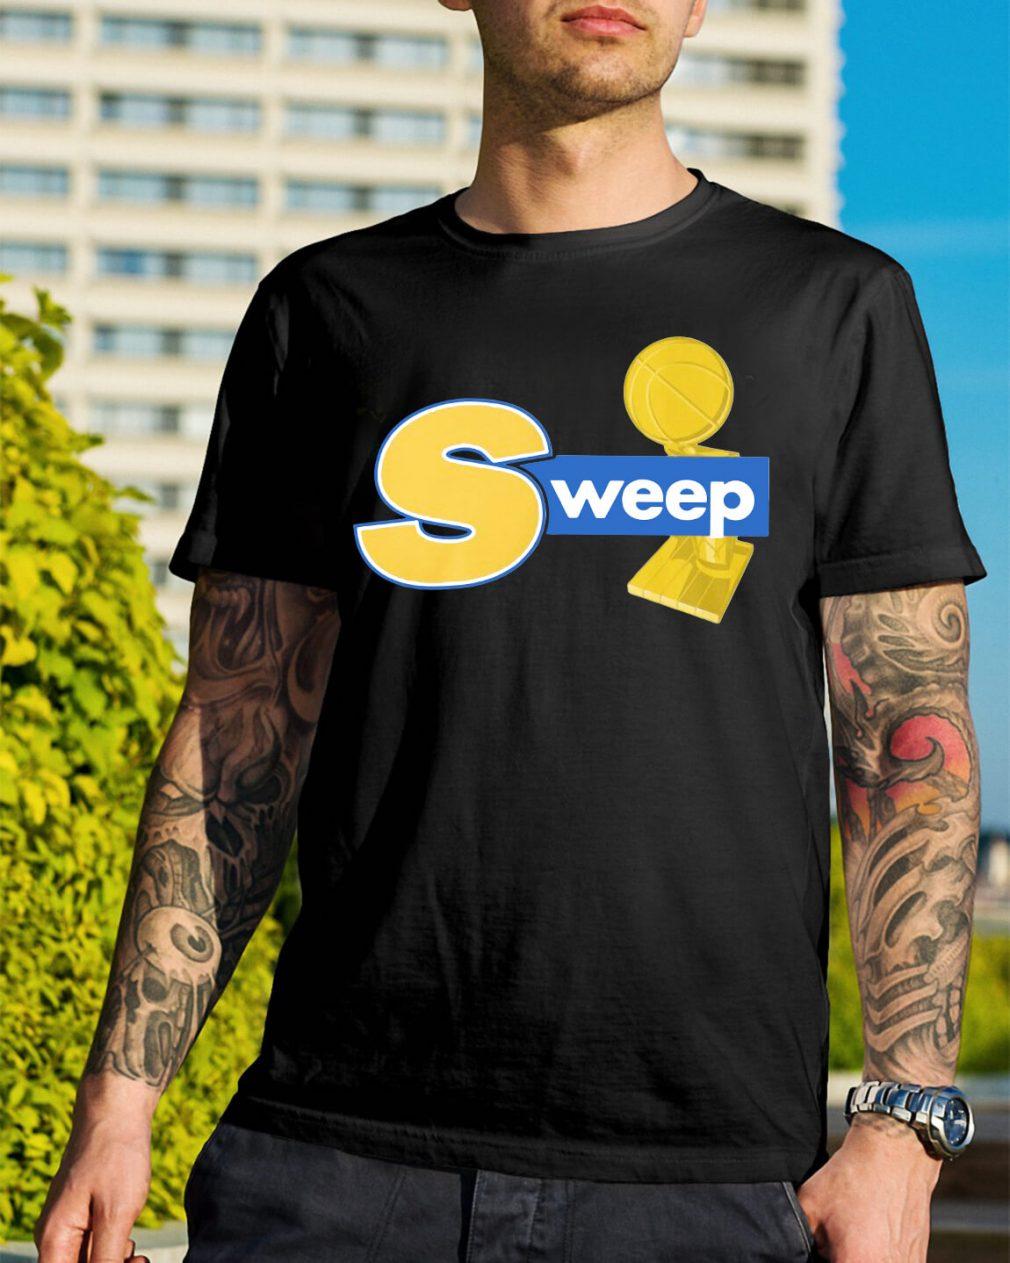 Warriors champs sweep shirt